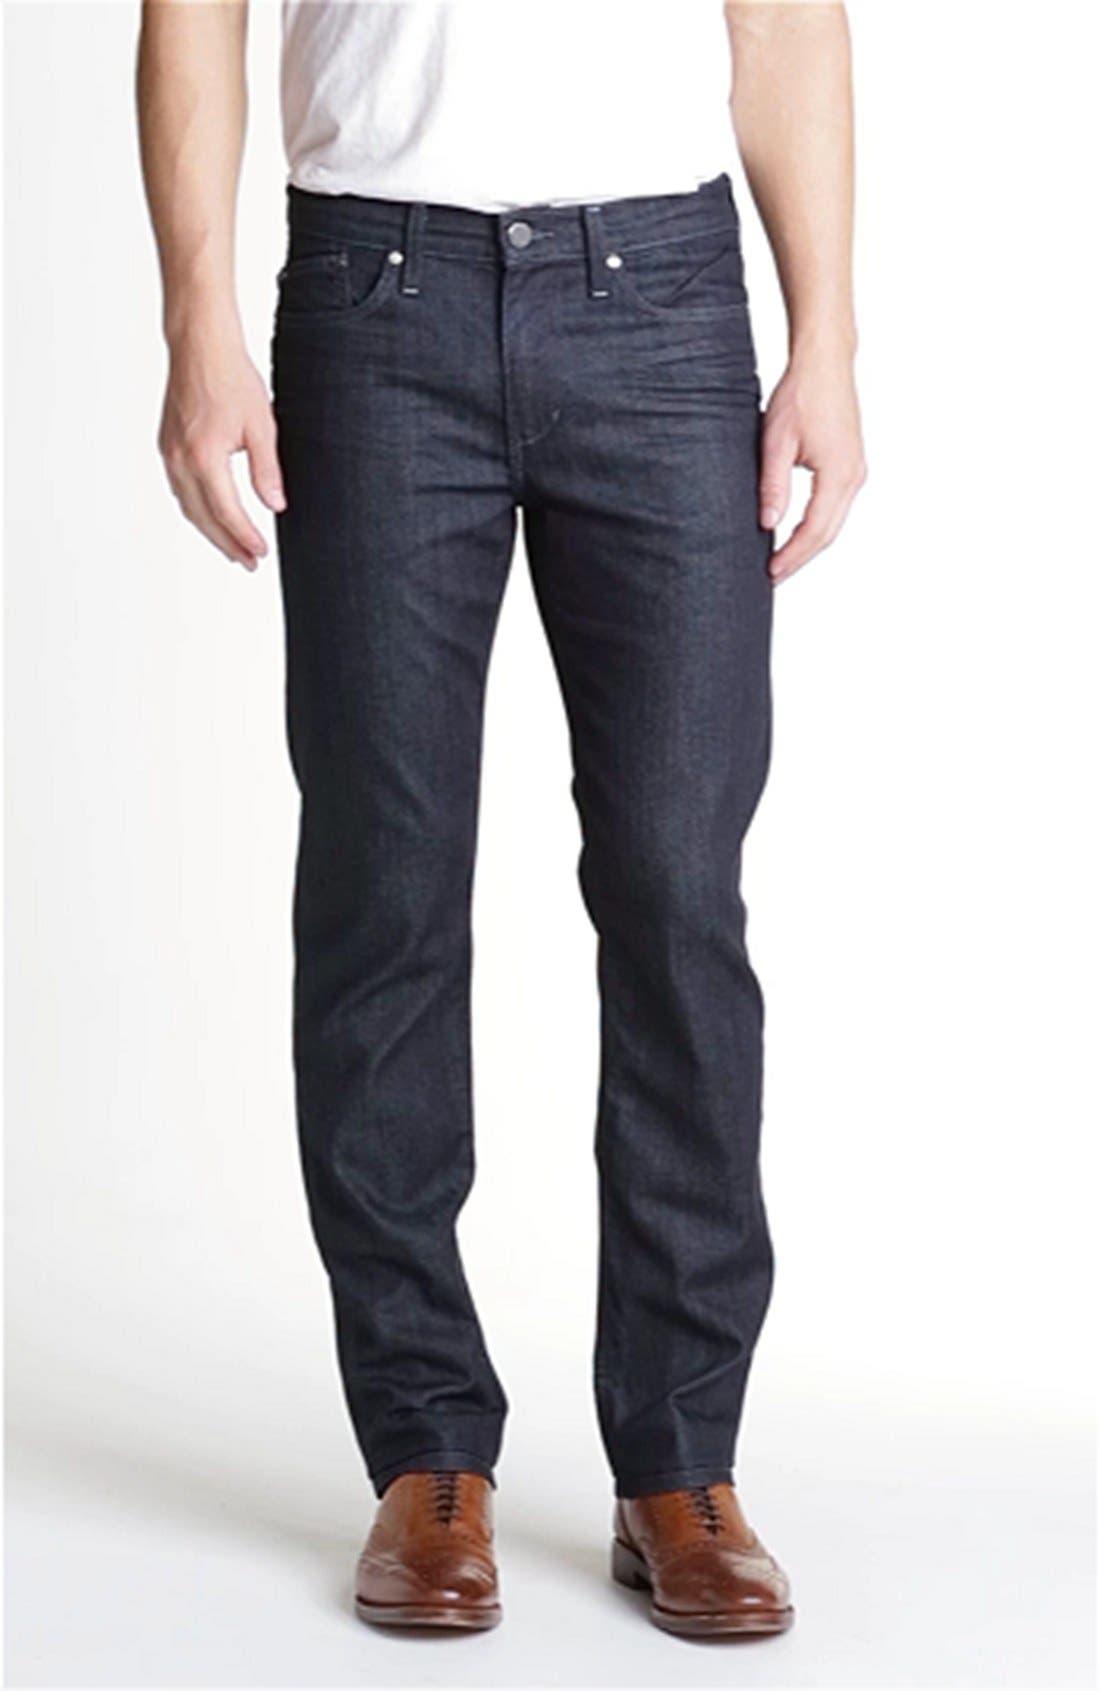 Brixton Slim Straight Fit Jeans,                             Alternate thumbnail 5, color,                             KING